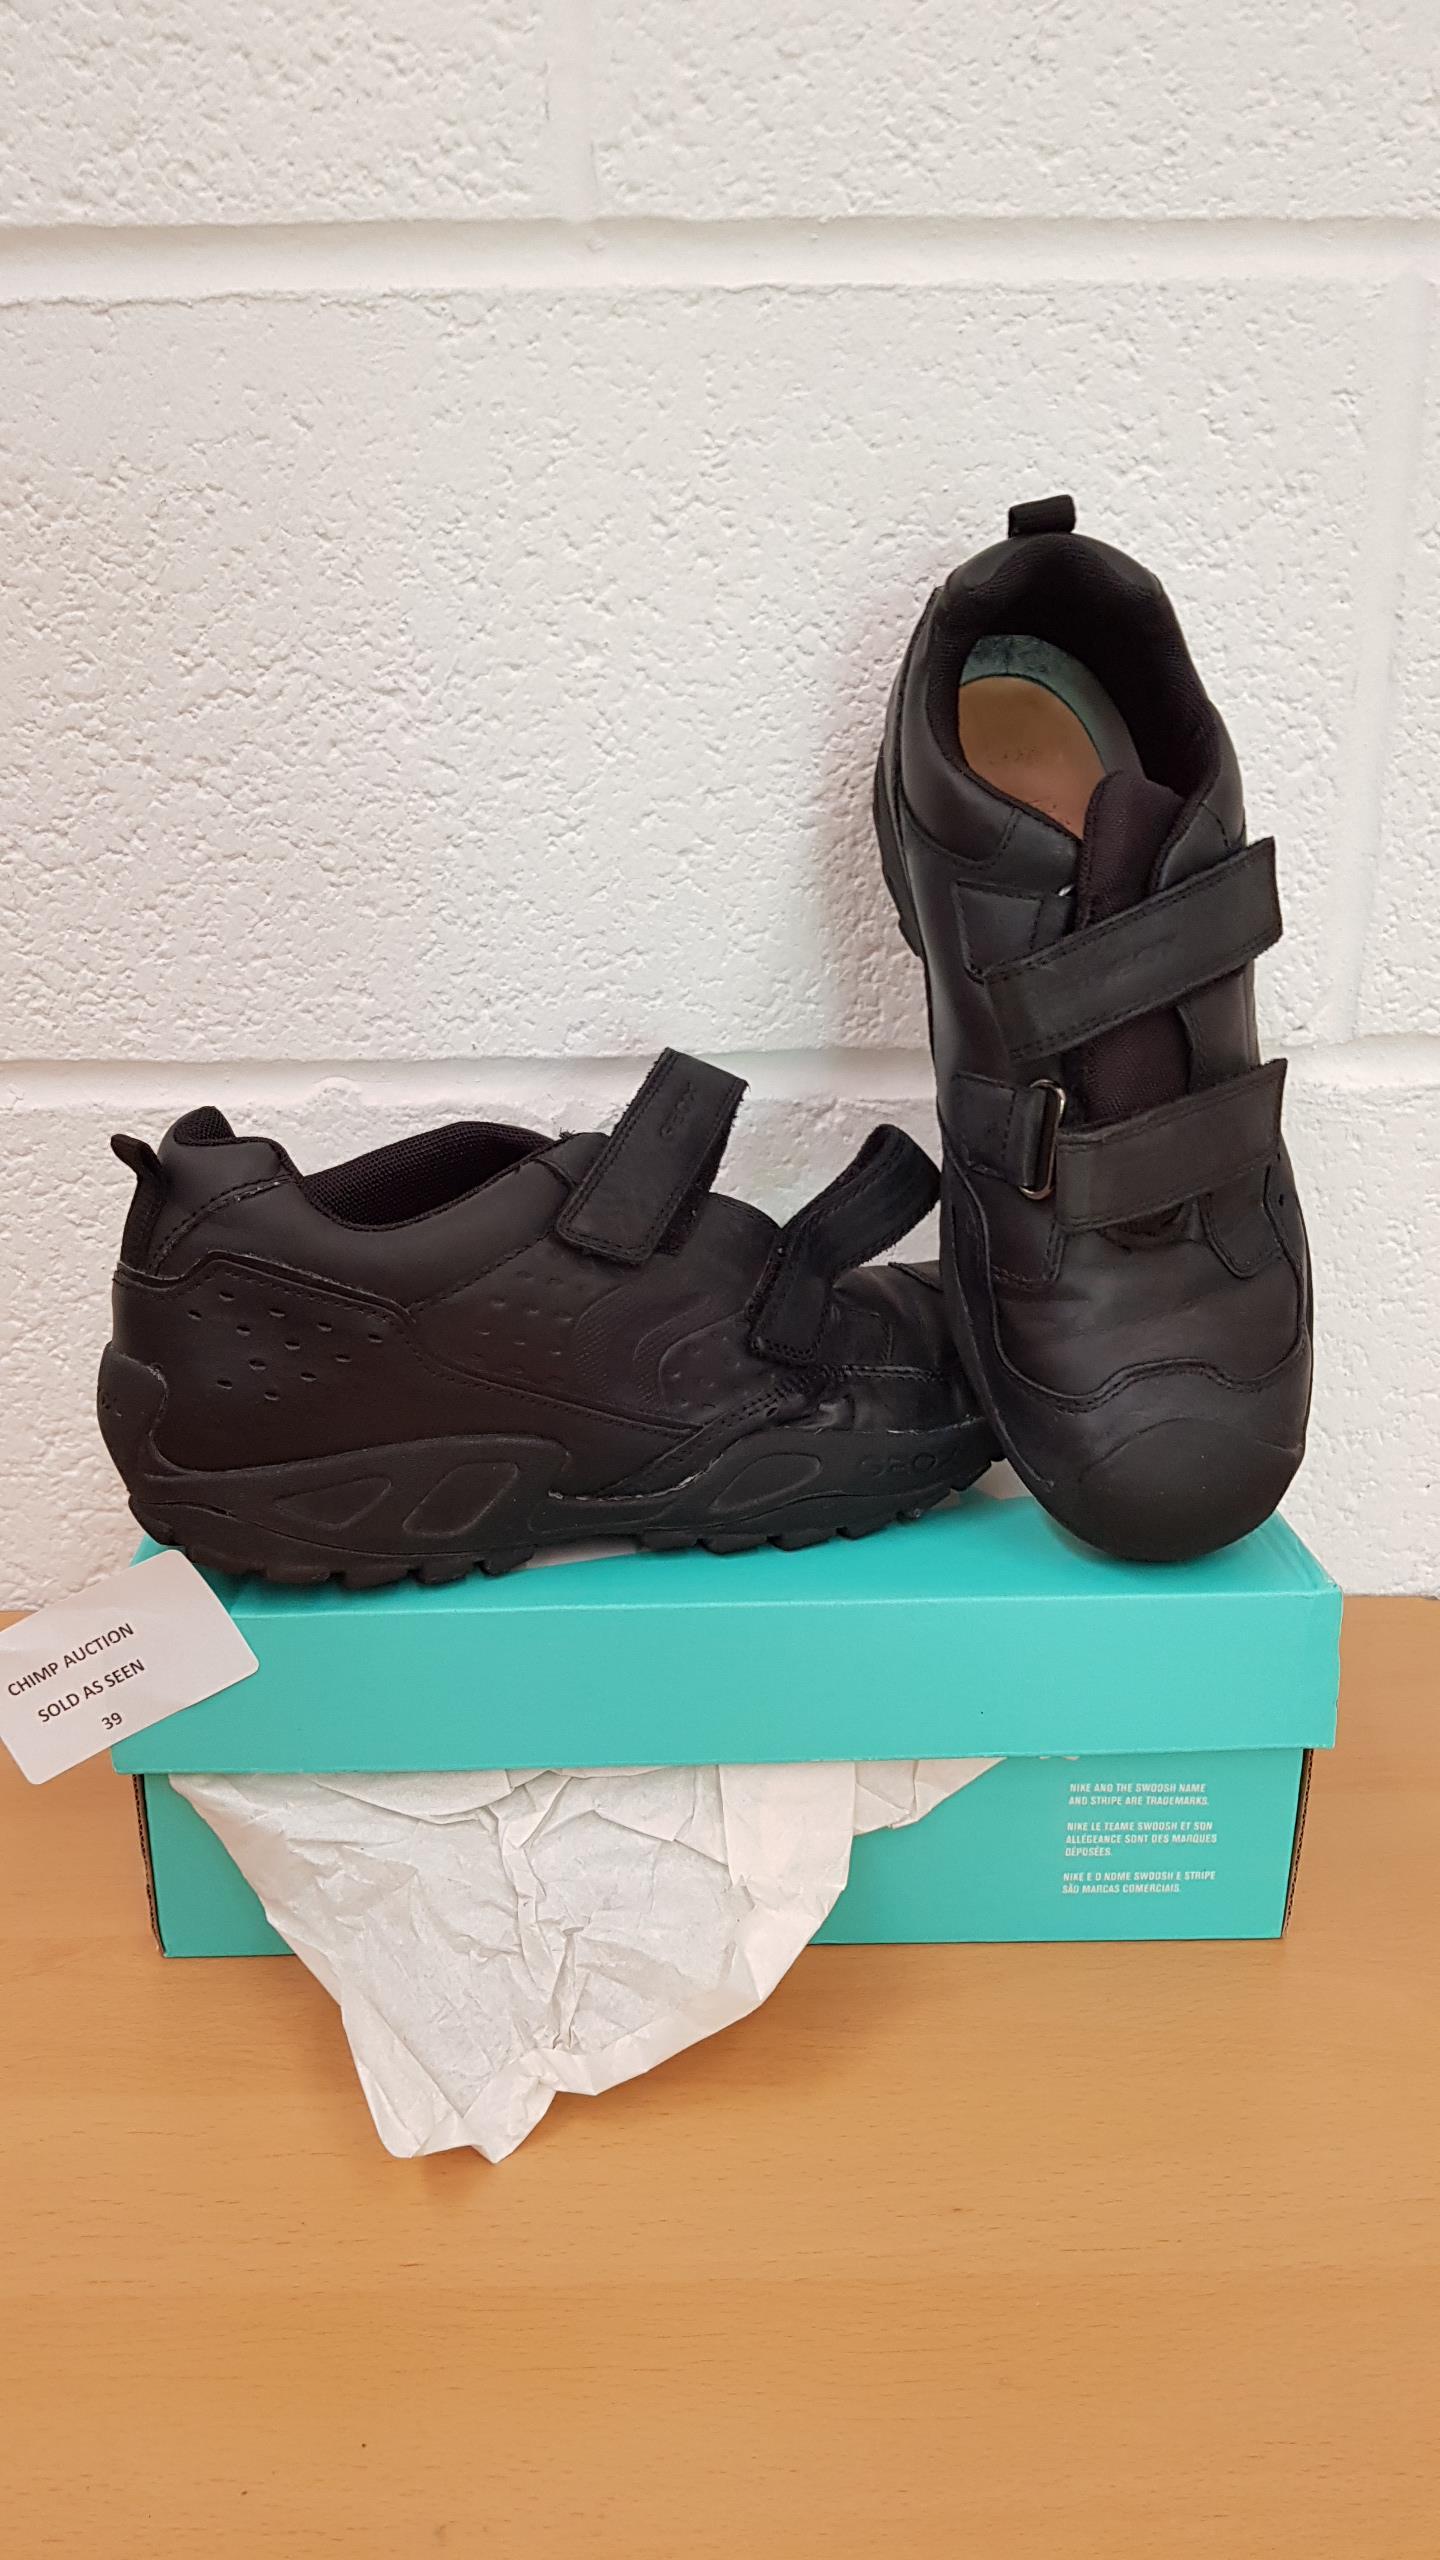 Lot 39 - Geox Respira shoes UK SIZE 6